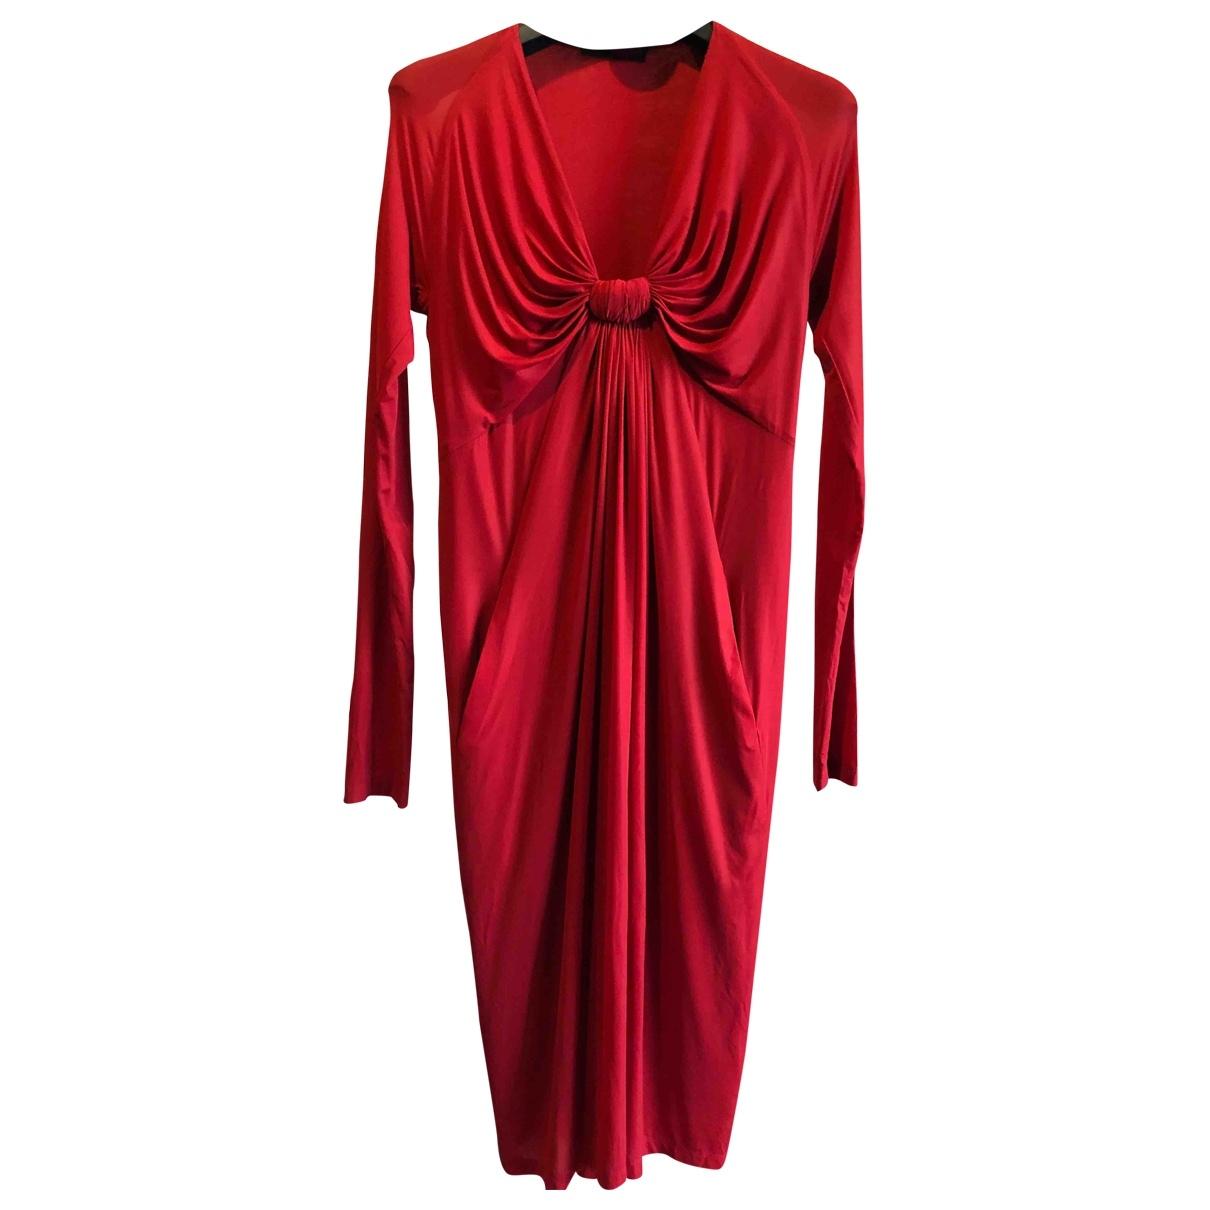 Donna Karan \N Kleid in  Rot Synthetik